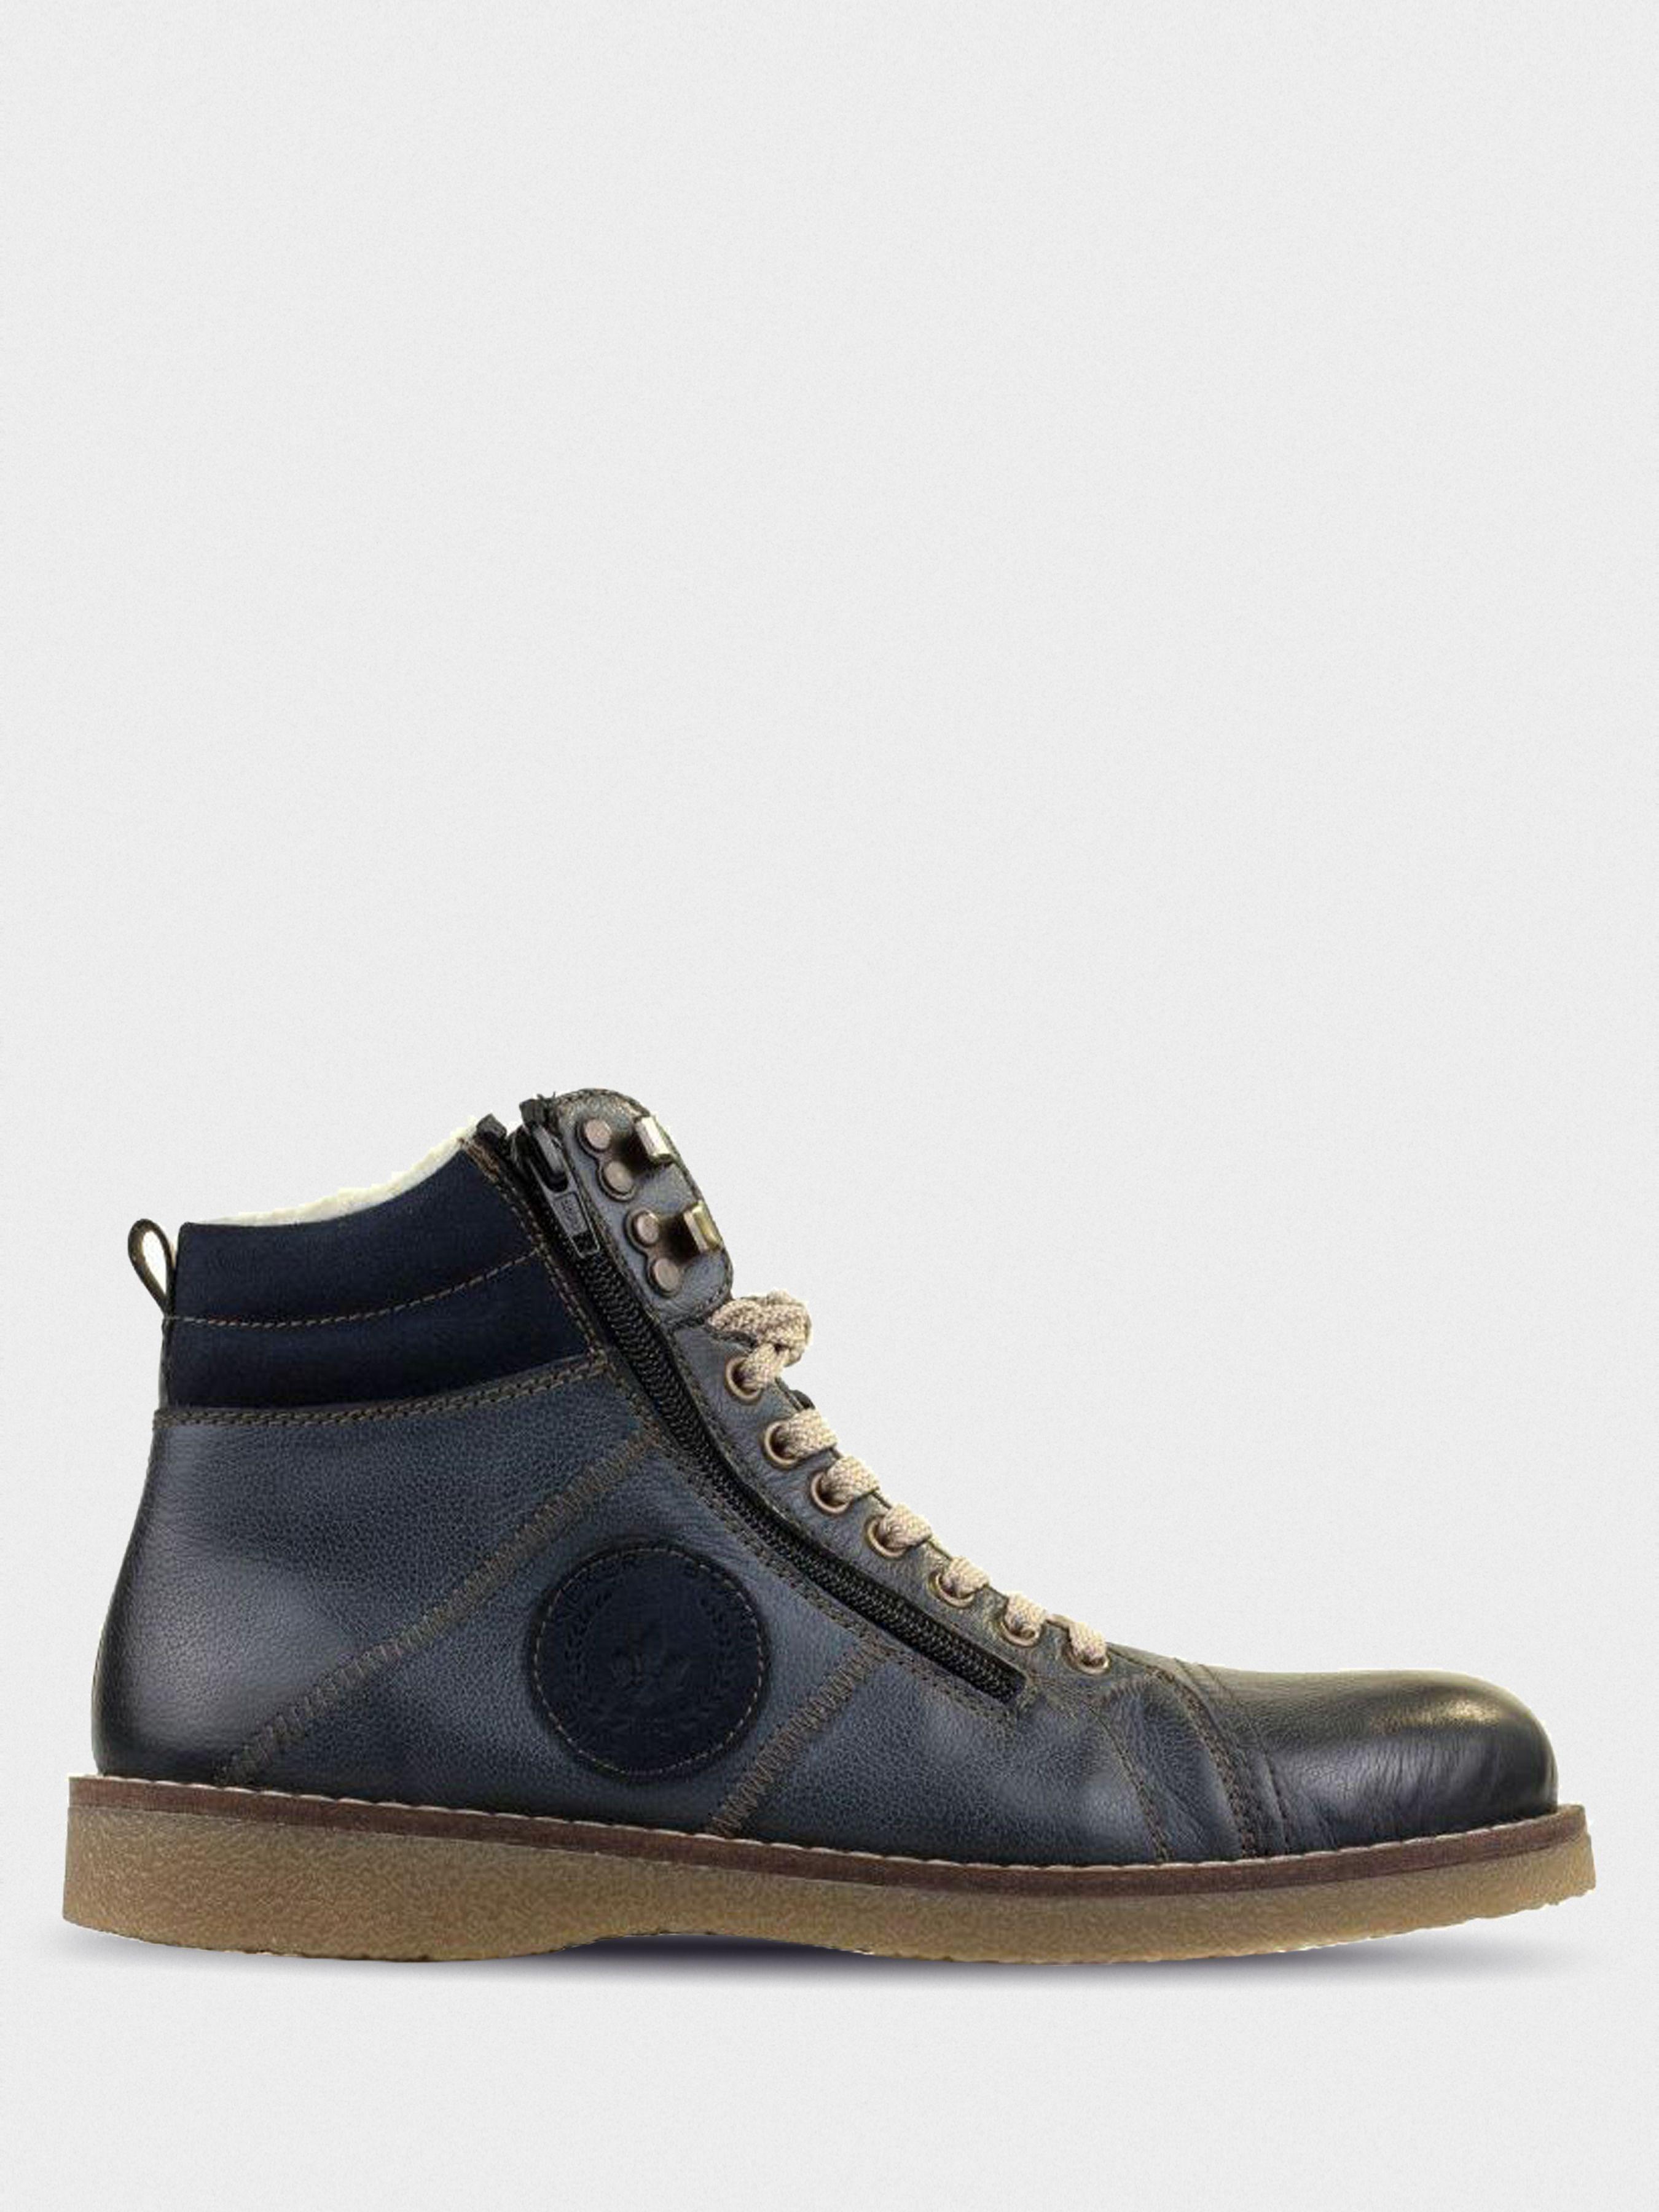 Купить Ботинки мужские RIEKER RK561, Синий